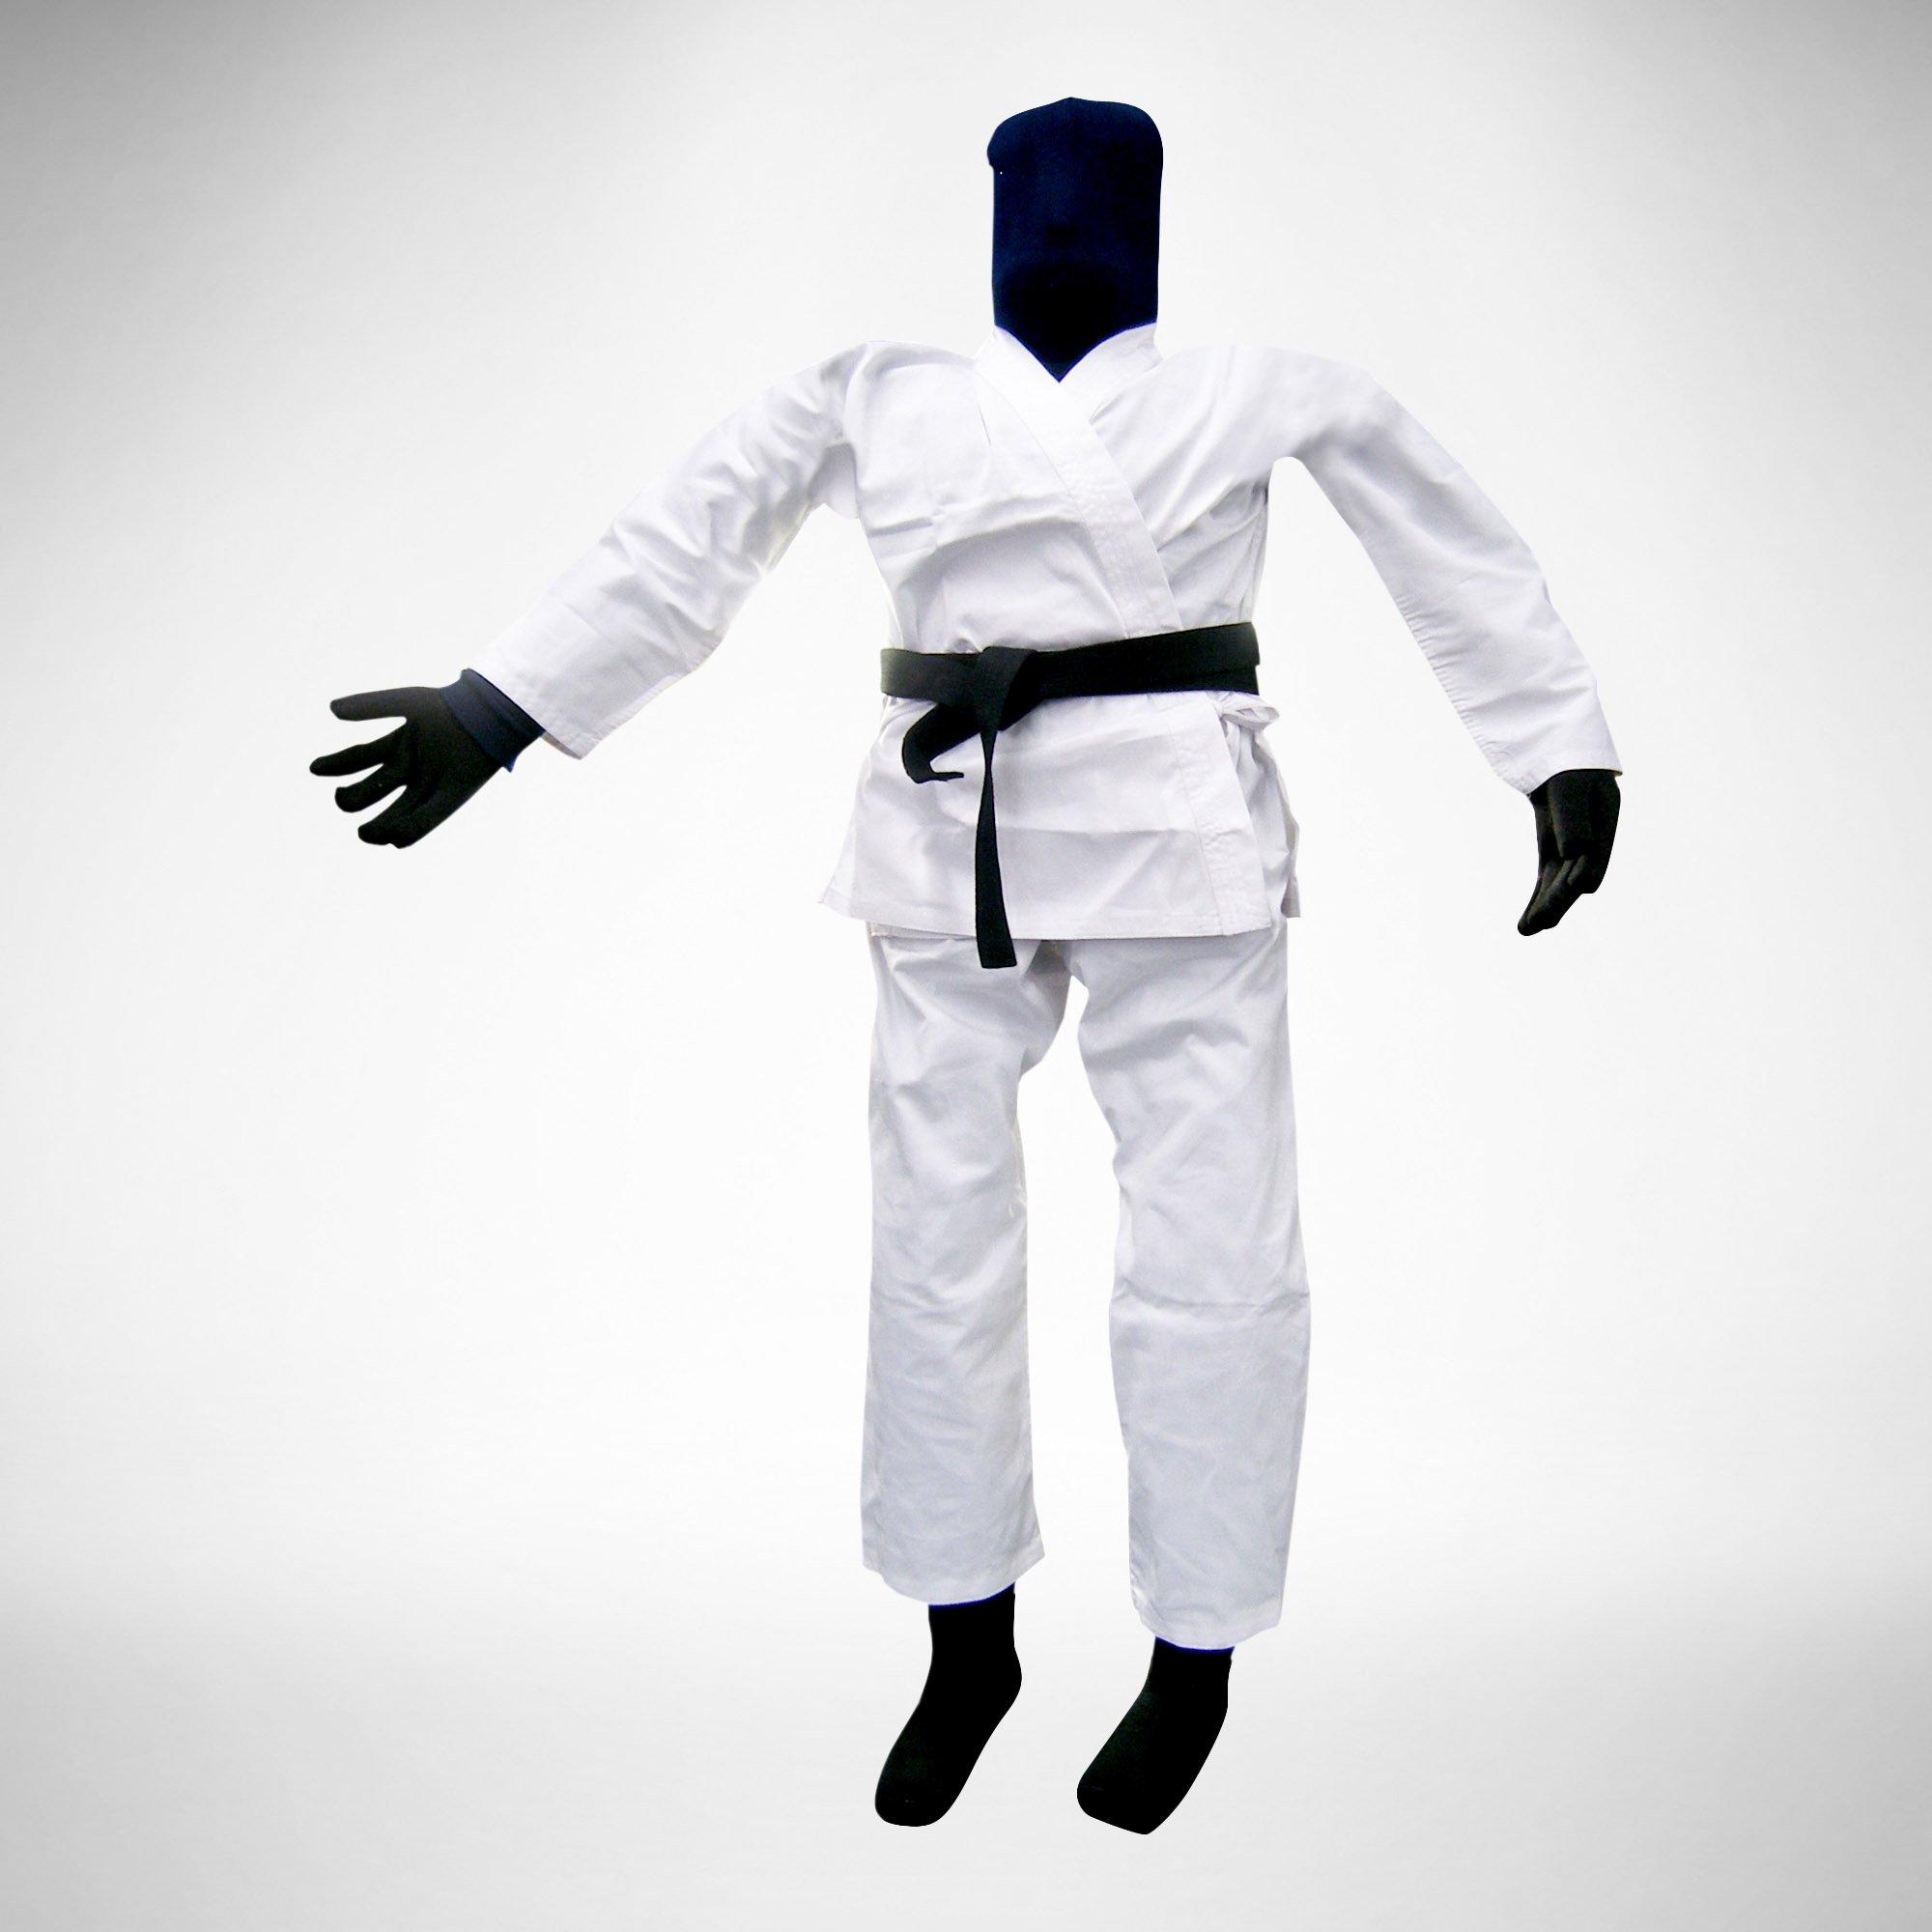 Buster Jr Child Grappling Dummy MMA Jiu Jitsu Judo Martial Art Training Man Boys by I & I Sports